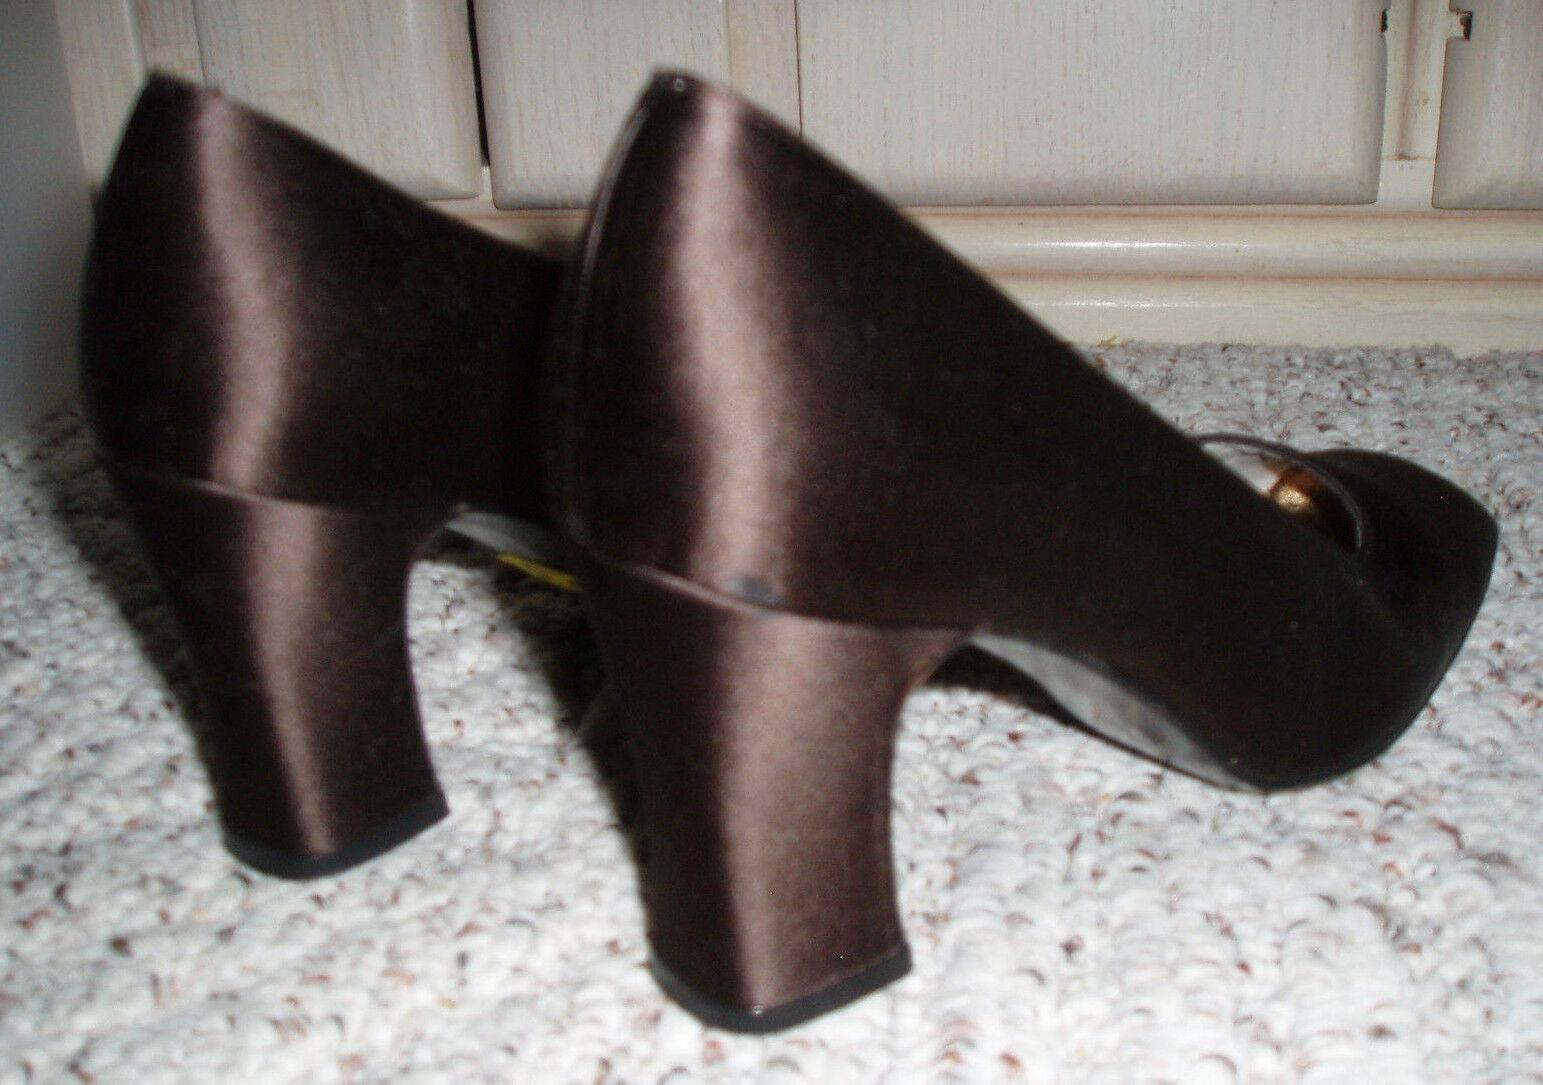 Vtg STUART WEITZMAN Satin Satin Satin Fabric High Heel Dress schuhebraunGröße 5.5 B 725e72